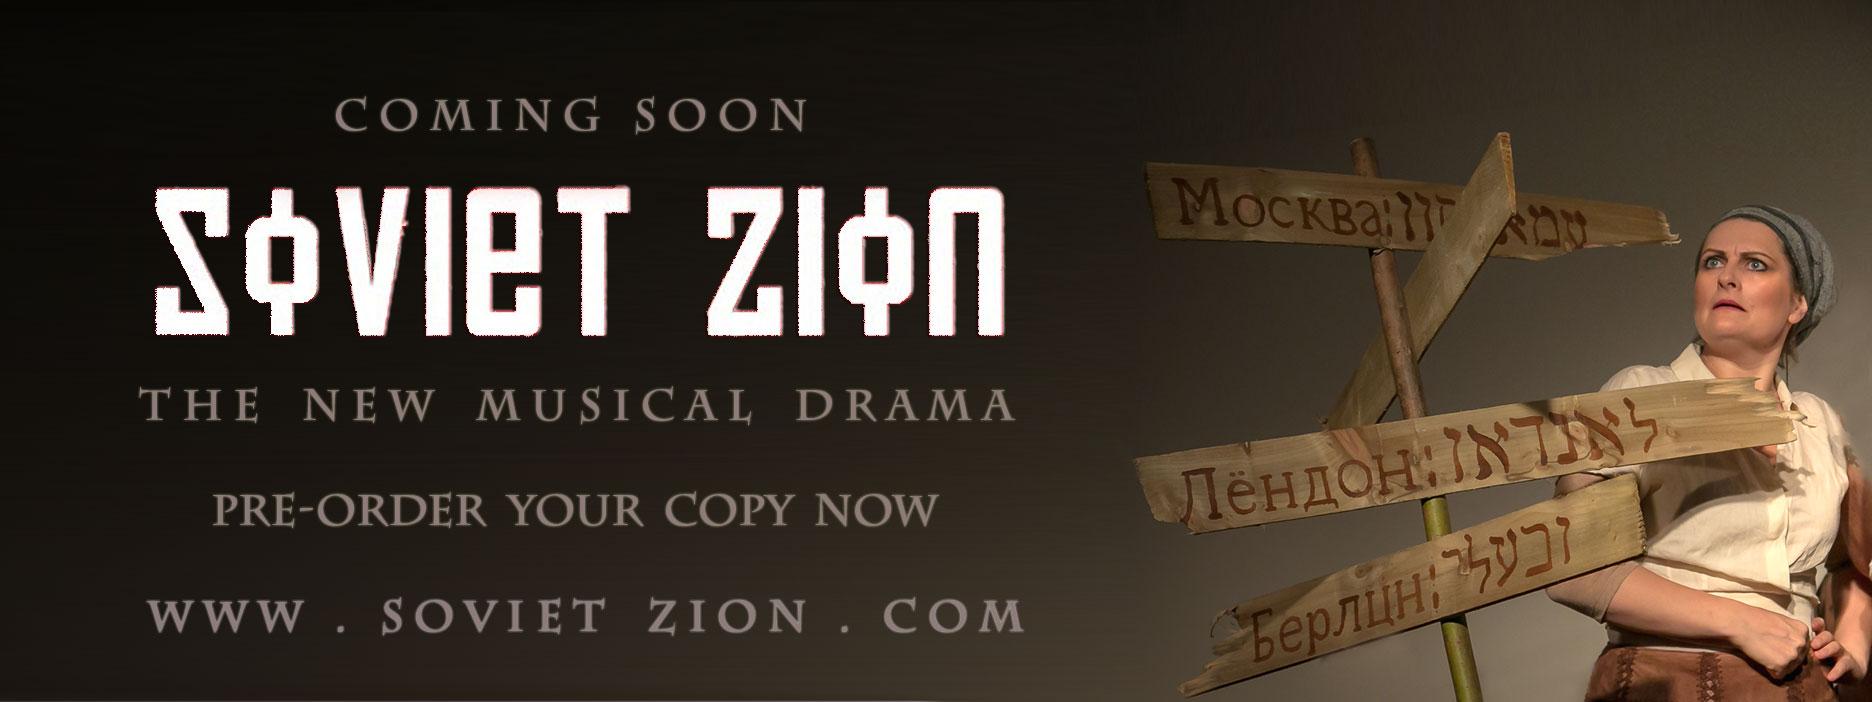 E-_Soviet-Zion_concept-album_new-poster-1